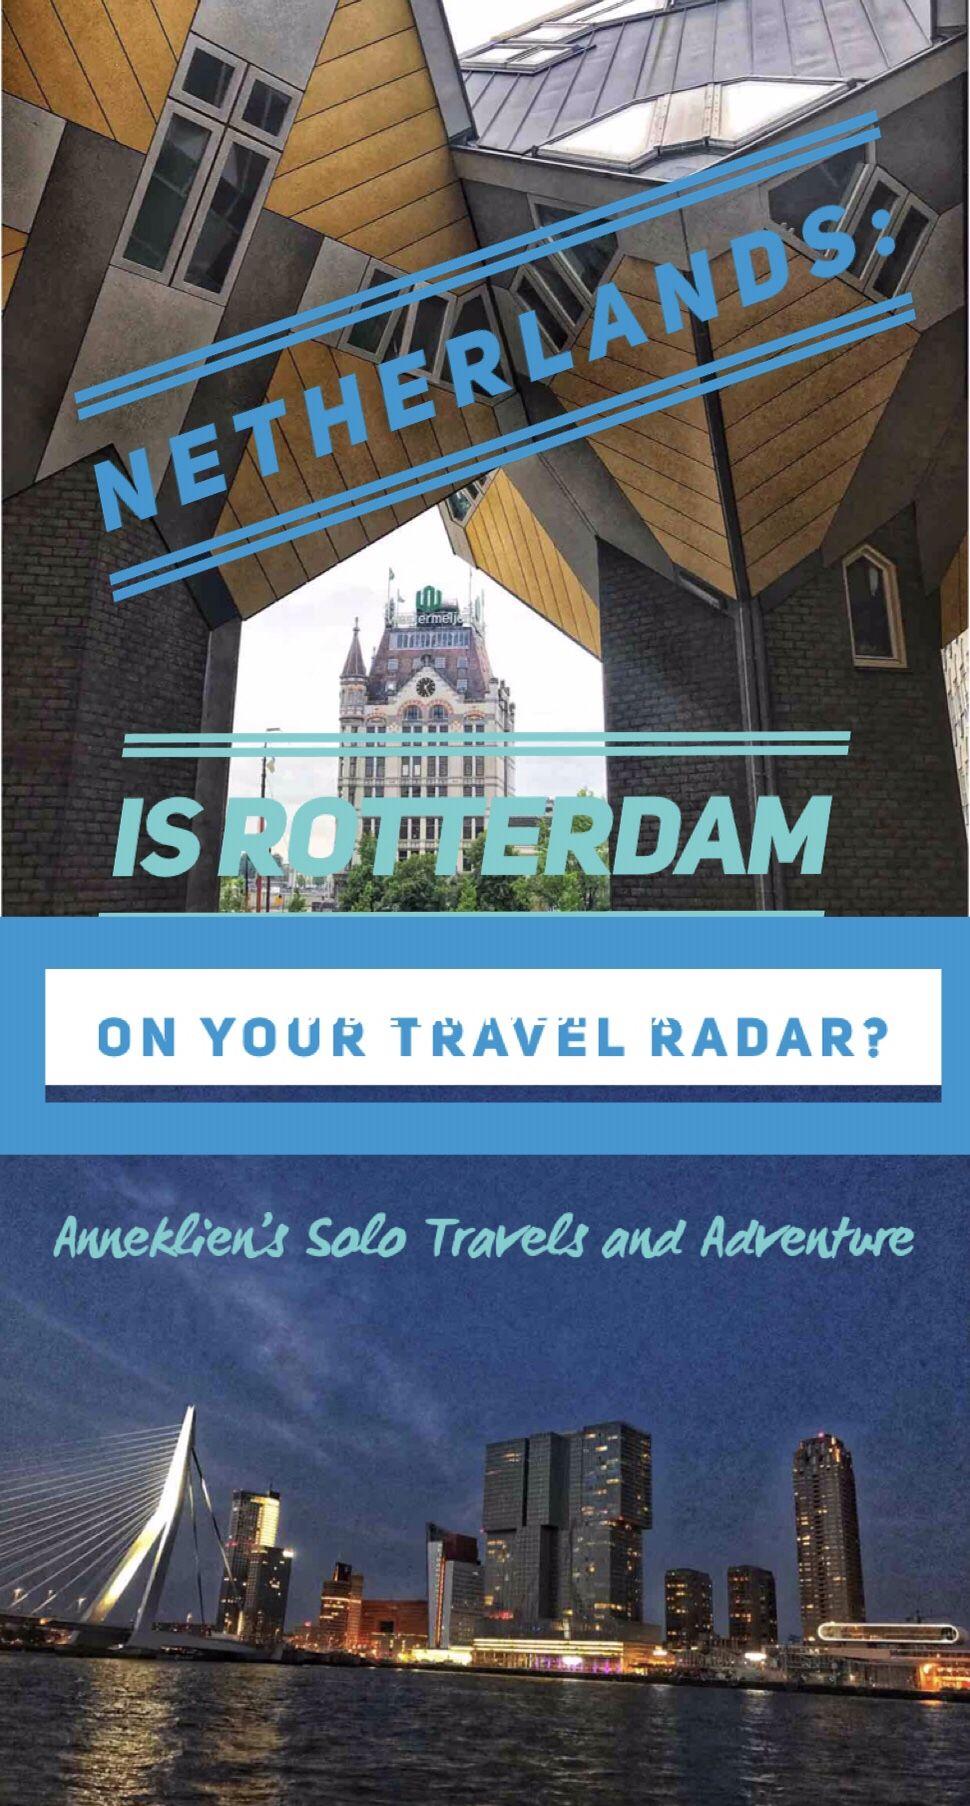 Netherlands Is Rotterdam On Your Travel Radar Anneklien Ssolotravelsandadventure Com Traveling By Yourself Adventure Travel Netherlands